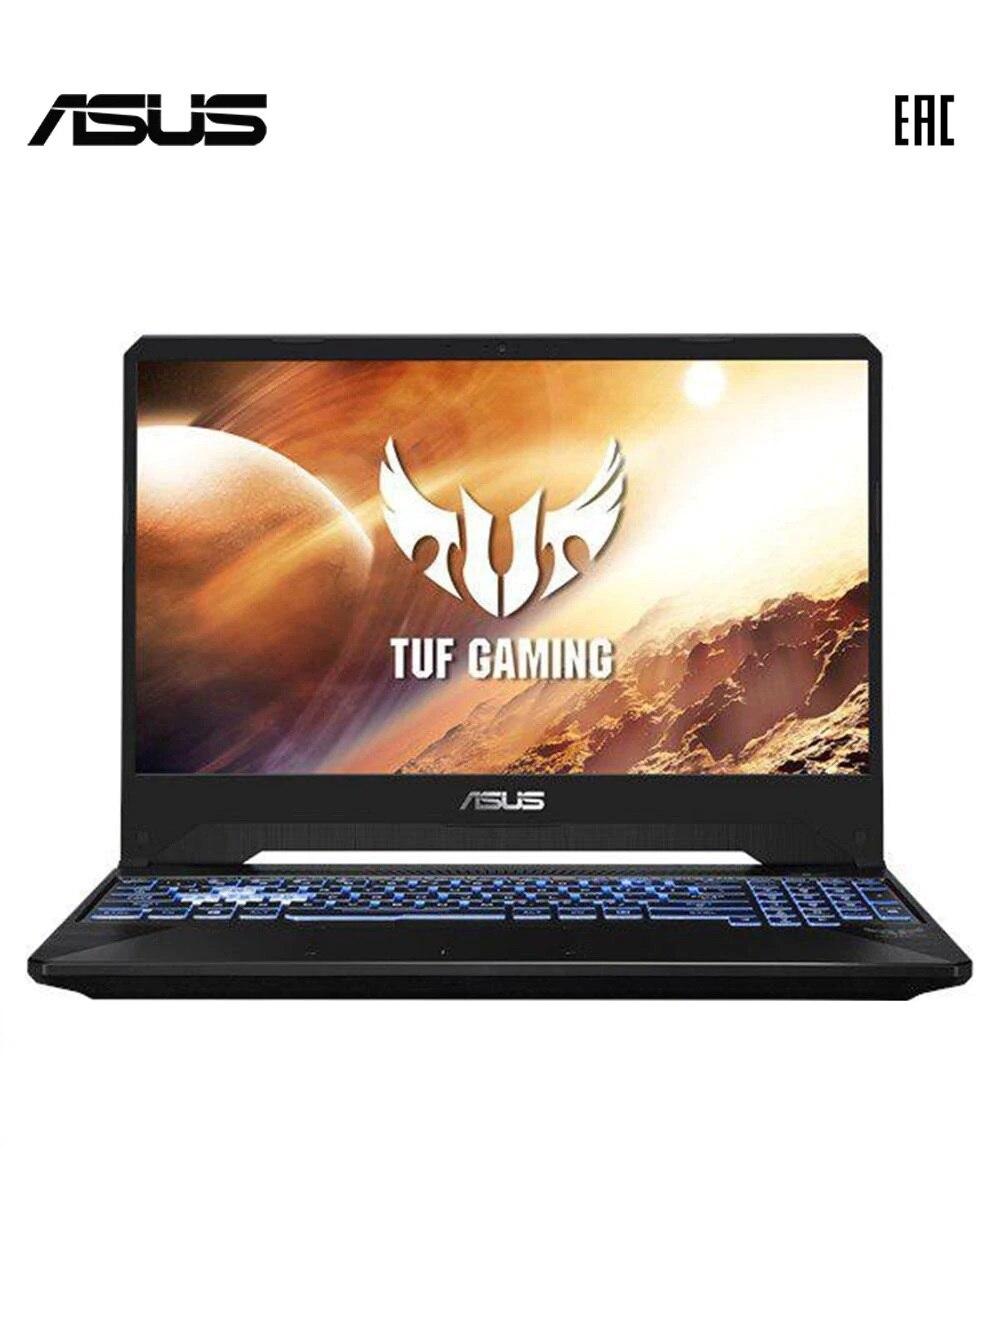 Ноутбук ASUS TUF Gaming FX505DT-AL097 15.6' FHD/ Ryzen 5 3550H/ 8Gb/512Gb SSD/GTX 1650 4Gb/Без ОС/Gold Steel